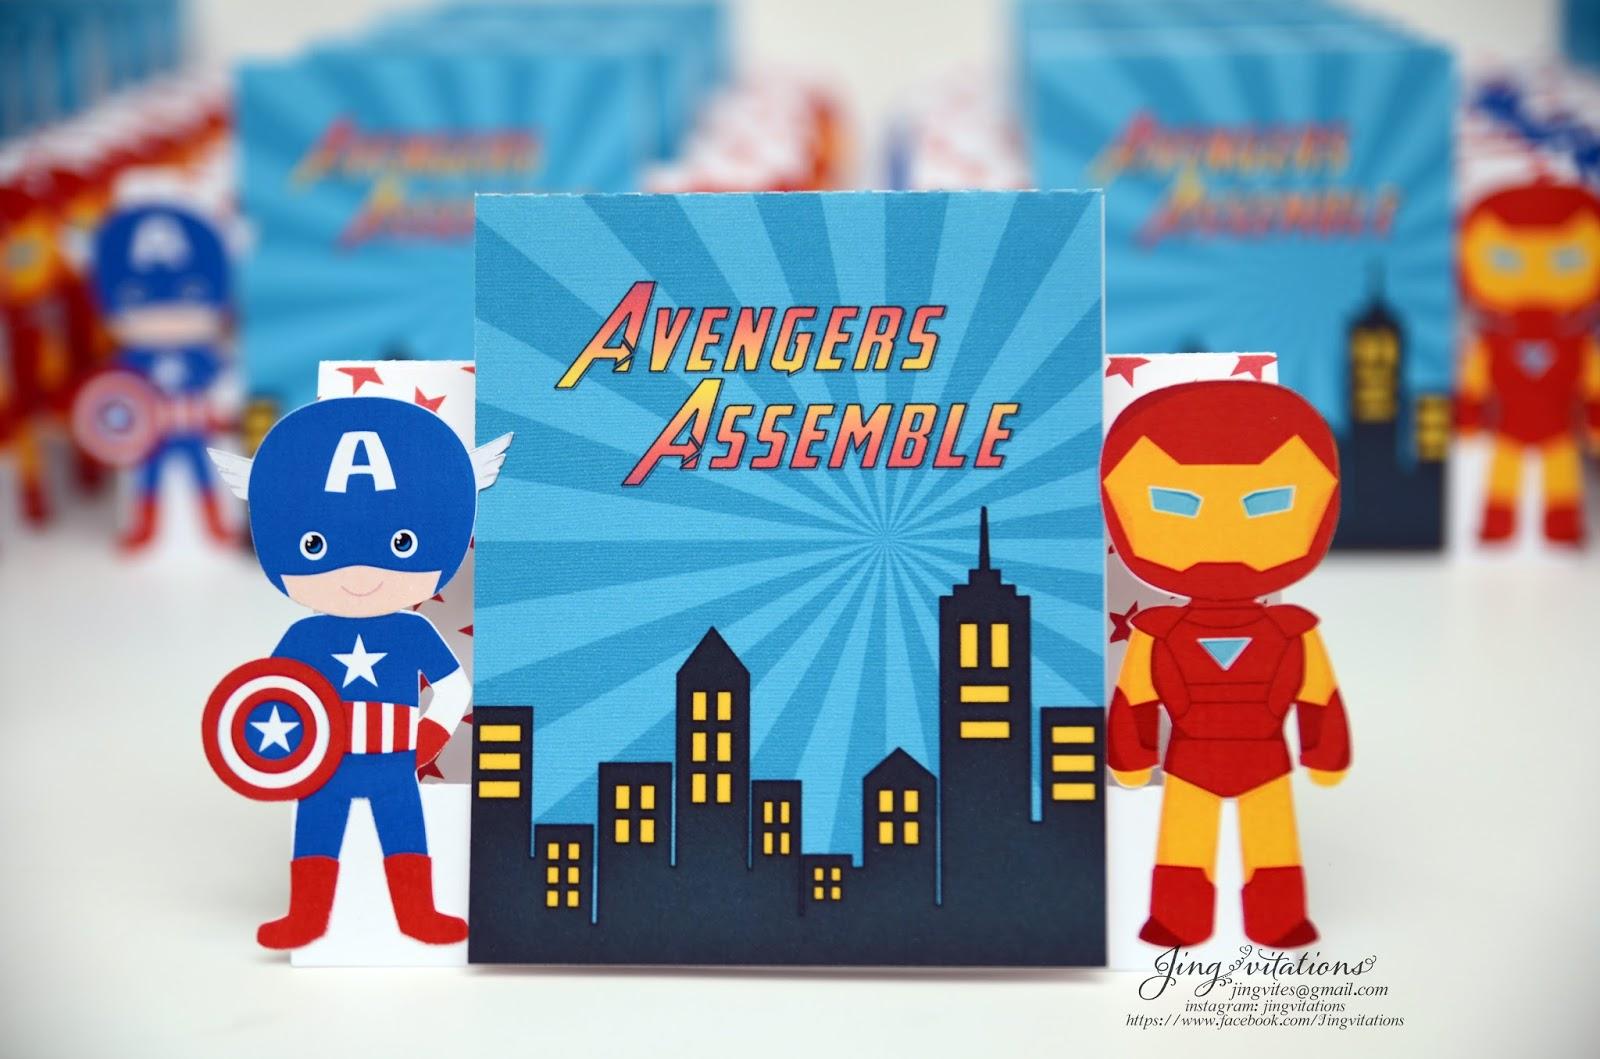 Jingvitations: Capt. America and IronMan Invitations